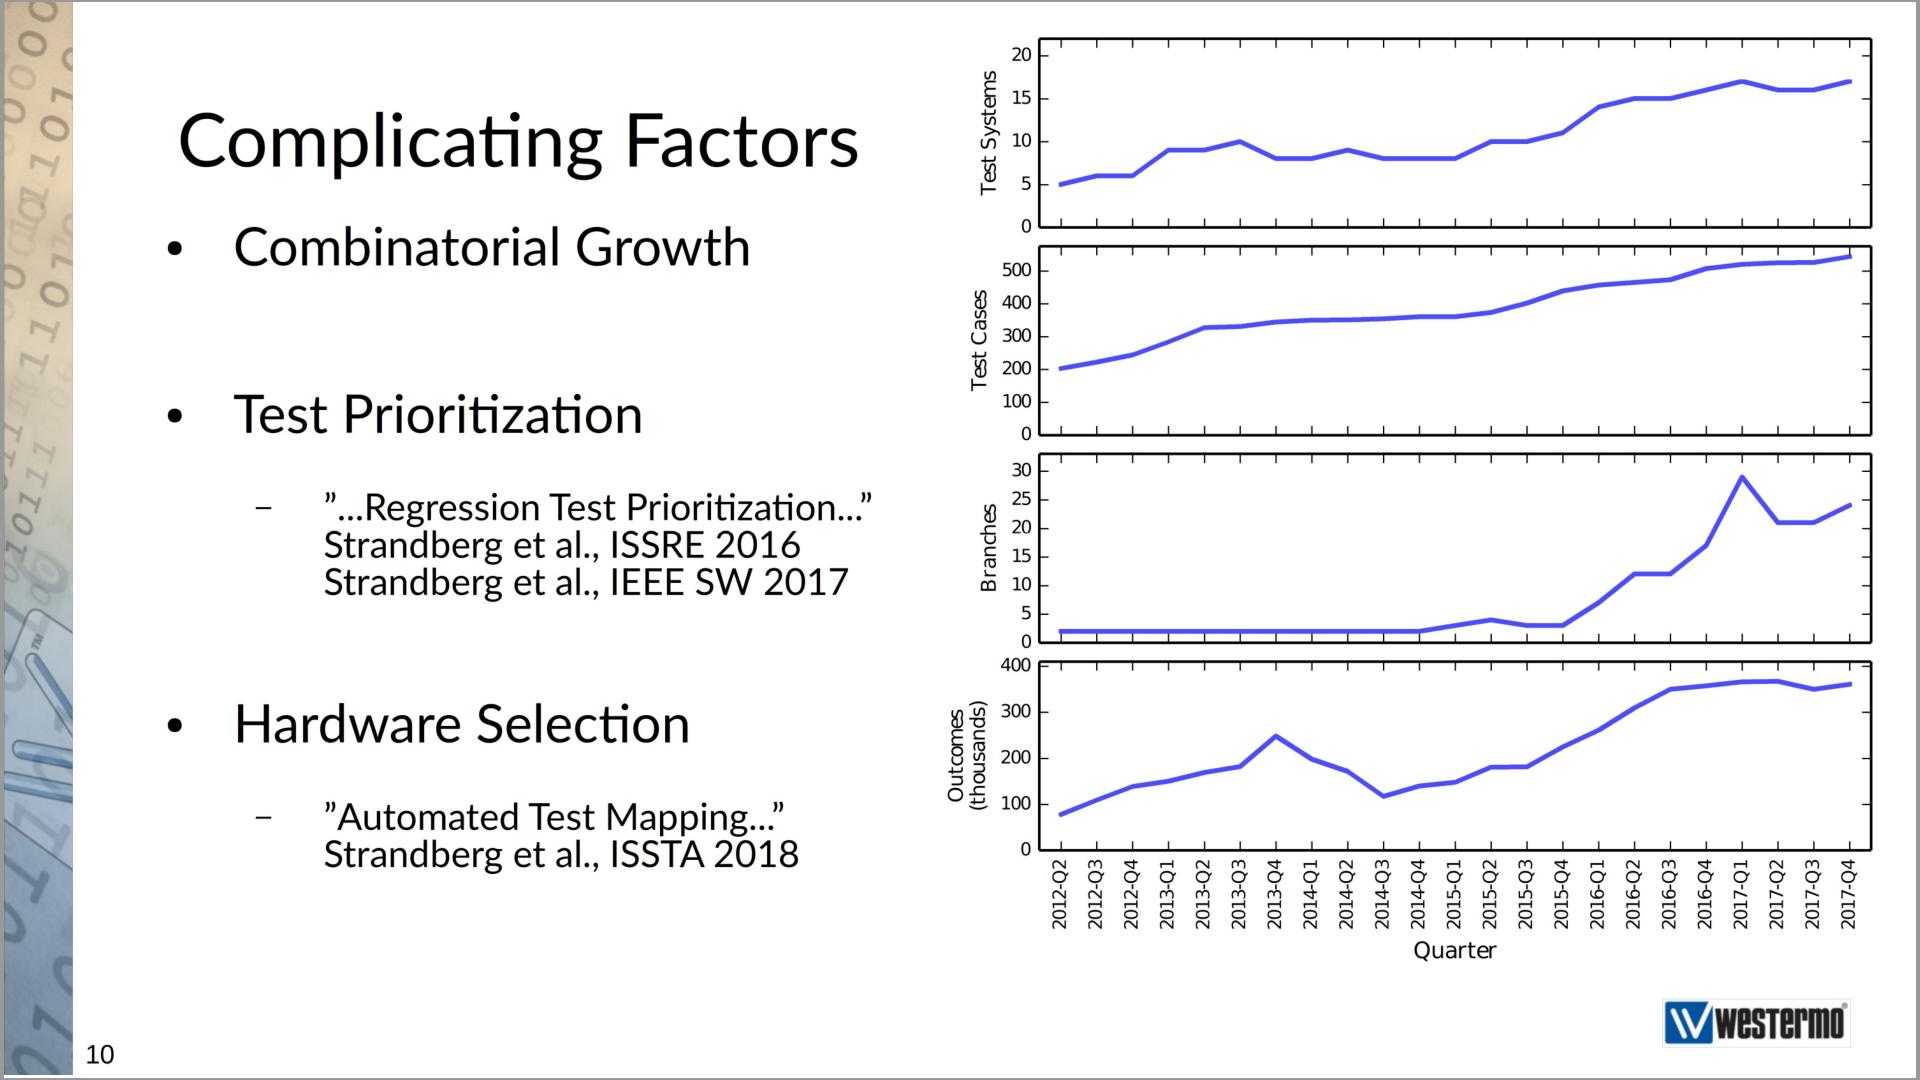 http://www.pererikstrandberg.se/publications/strandberg-2018-growth.png